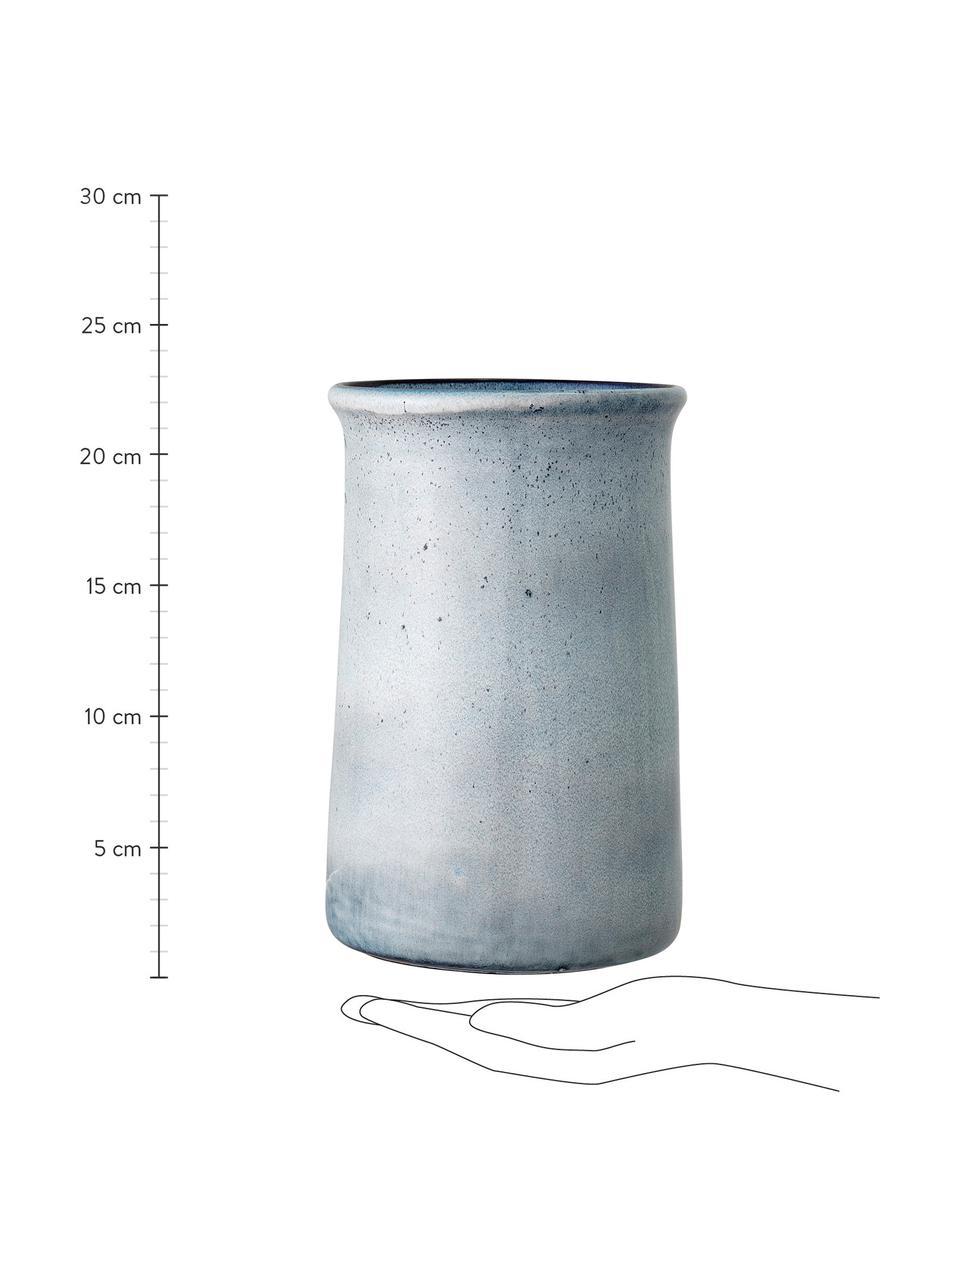 Refrigeratore bottiglie in gres blu fatto a mano Sandrine, Gres, Tonalità blu, Ø 15 x Alt. 23 cm